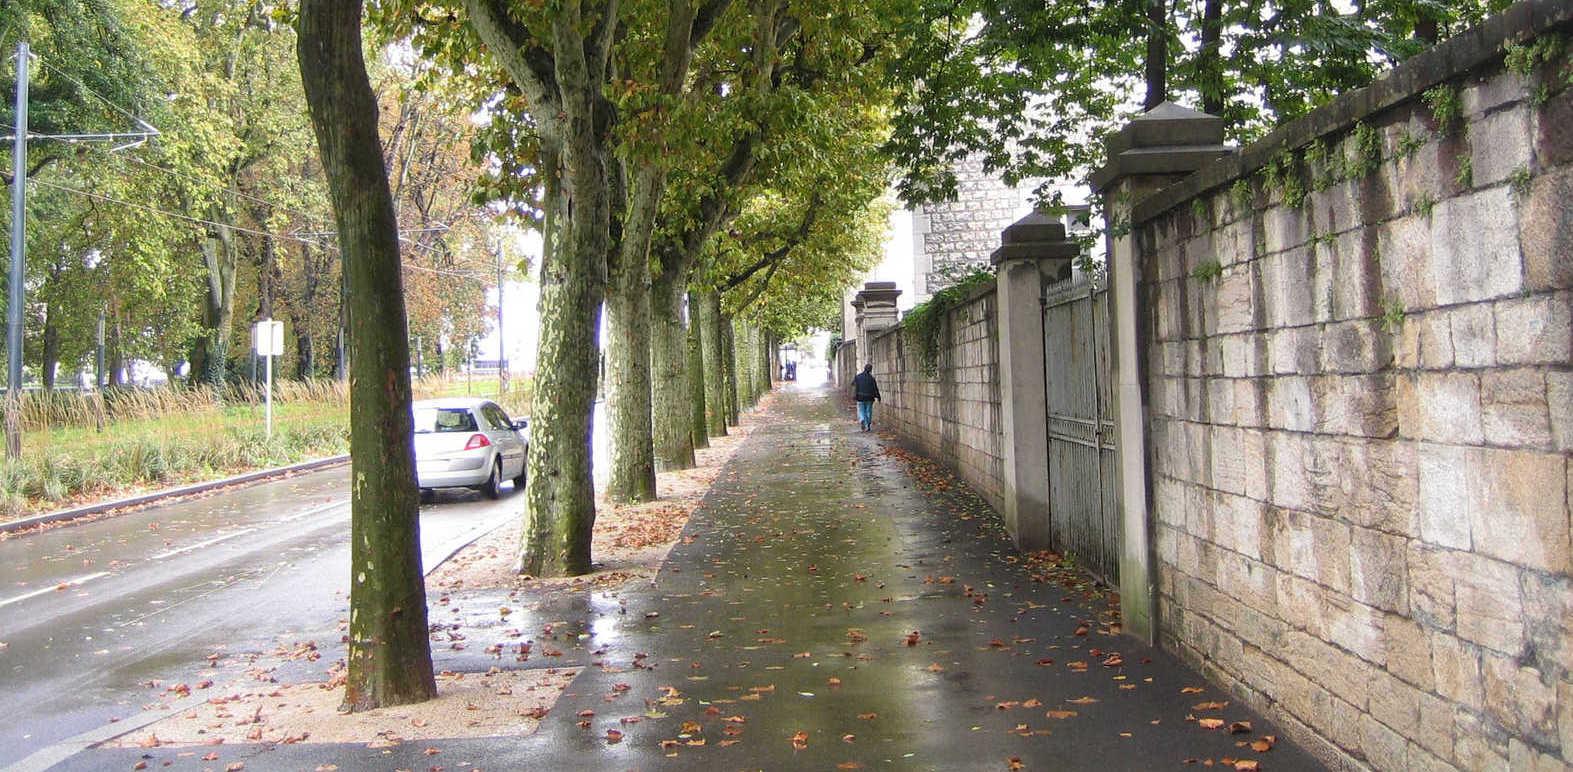 8_Doubs_Besançon_IMG_1113